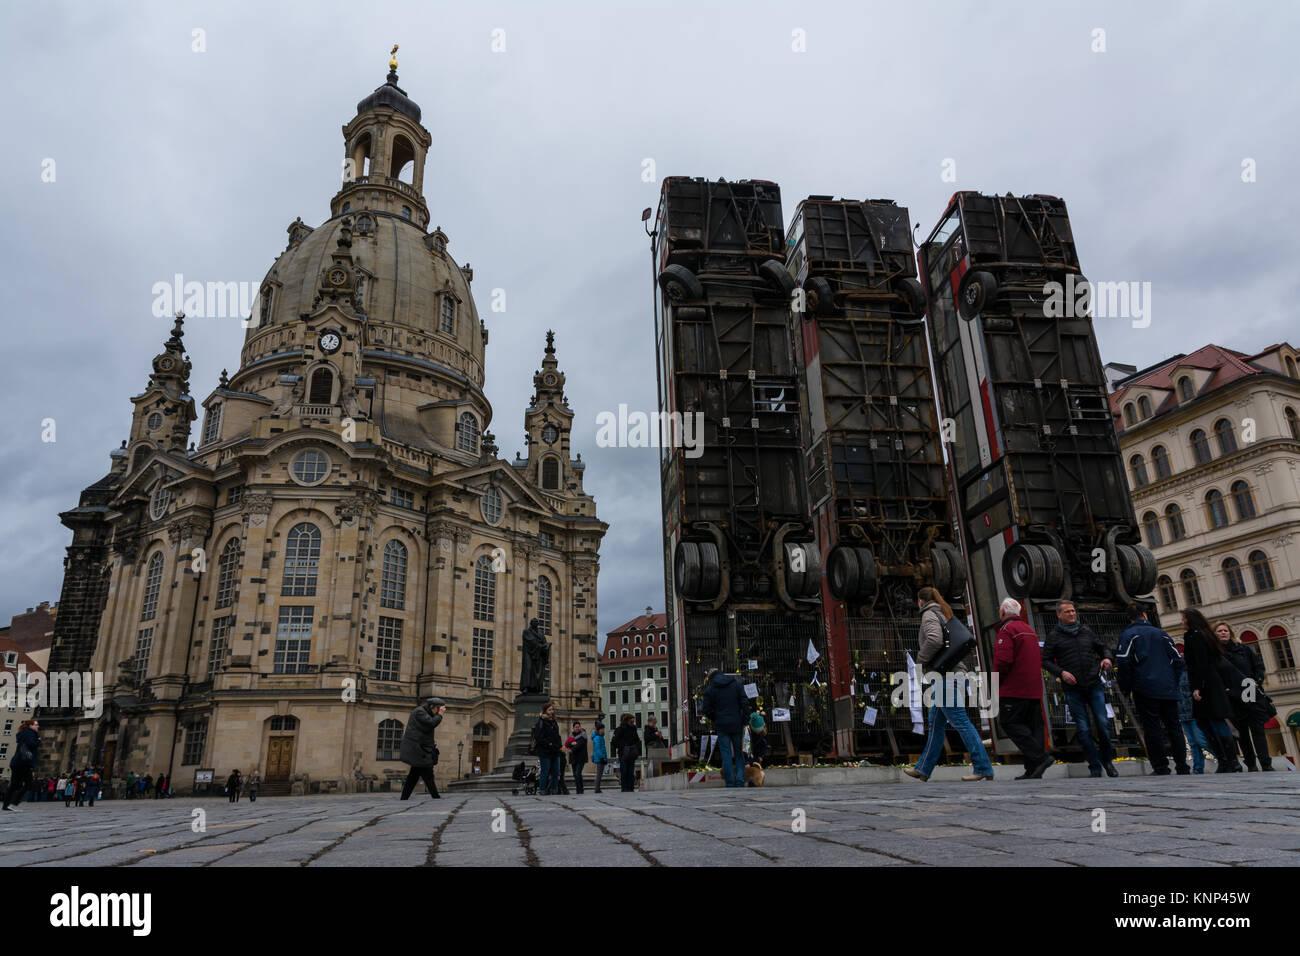 Dresden Frauenkirche Exterior City Landscape Square Marktplatz Center Architecture Beautiful Religious Monument - Stock Image